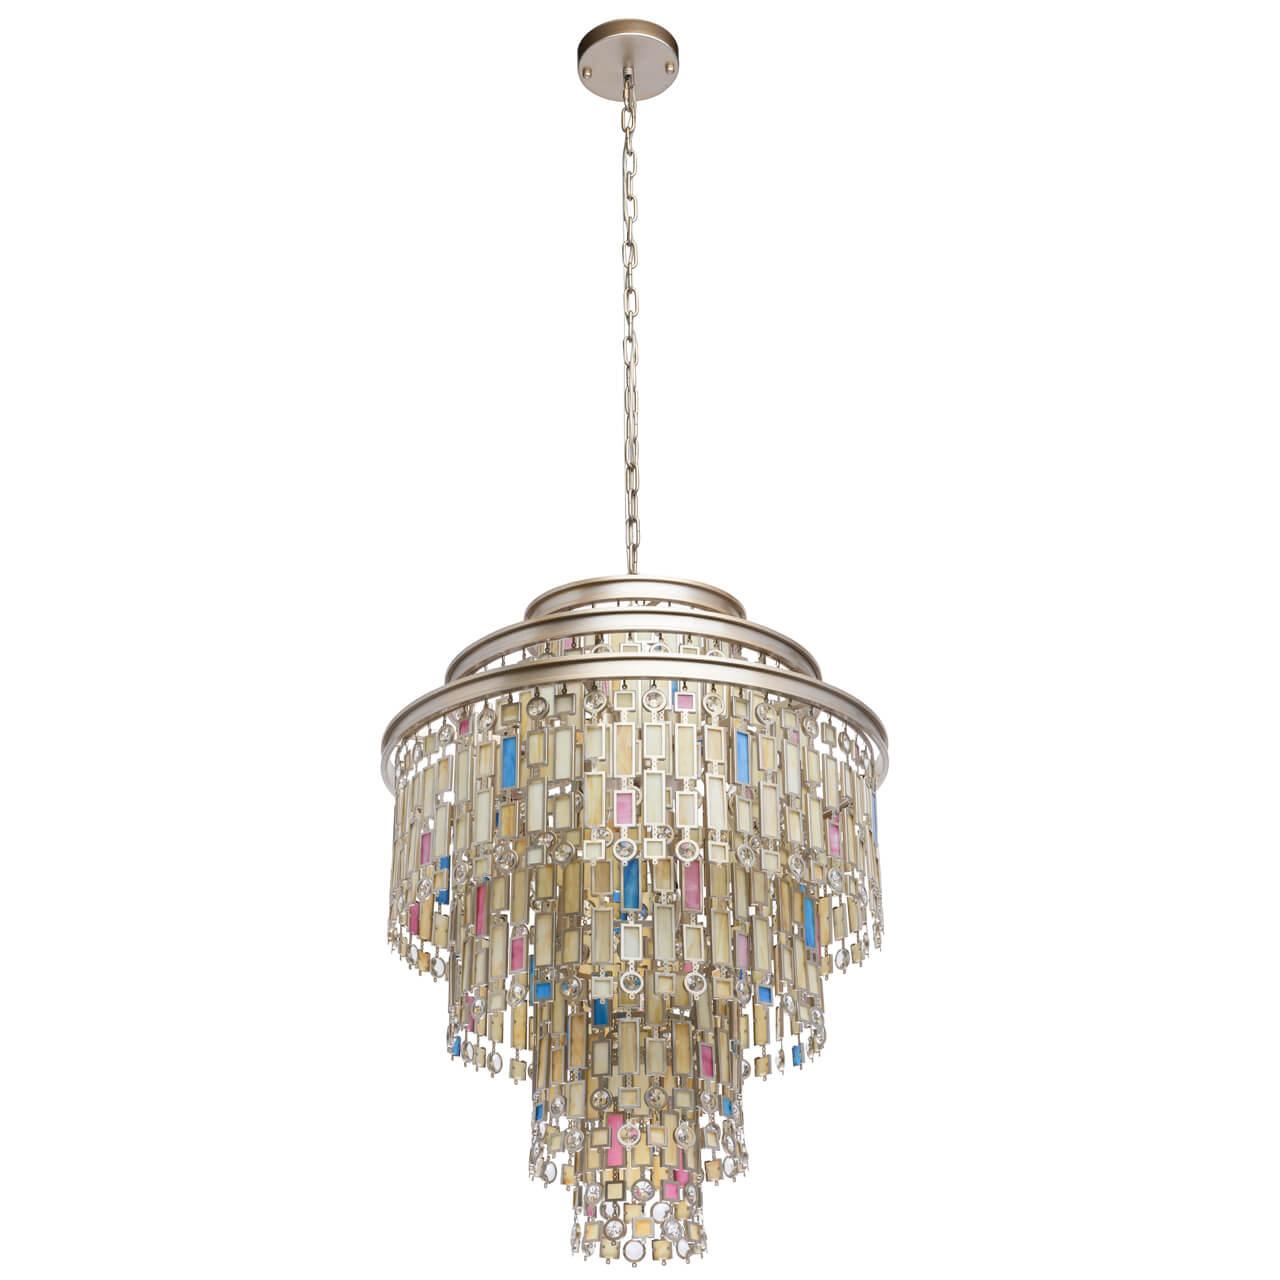 Люстра MW-Light 185010913 Марокко 2 косметика из марокко купить